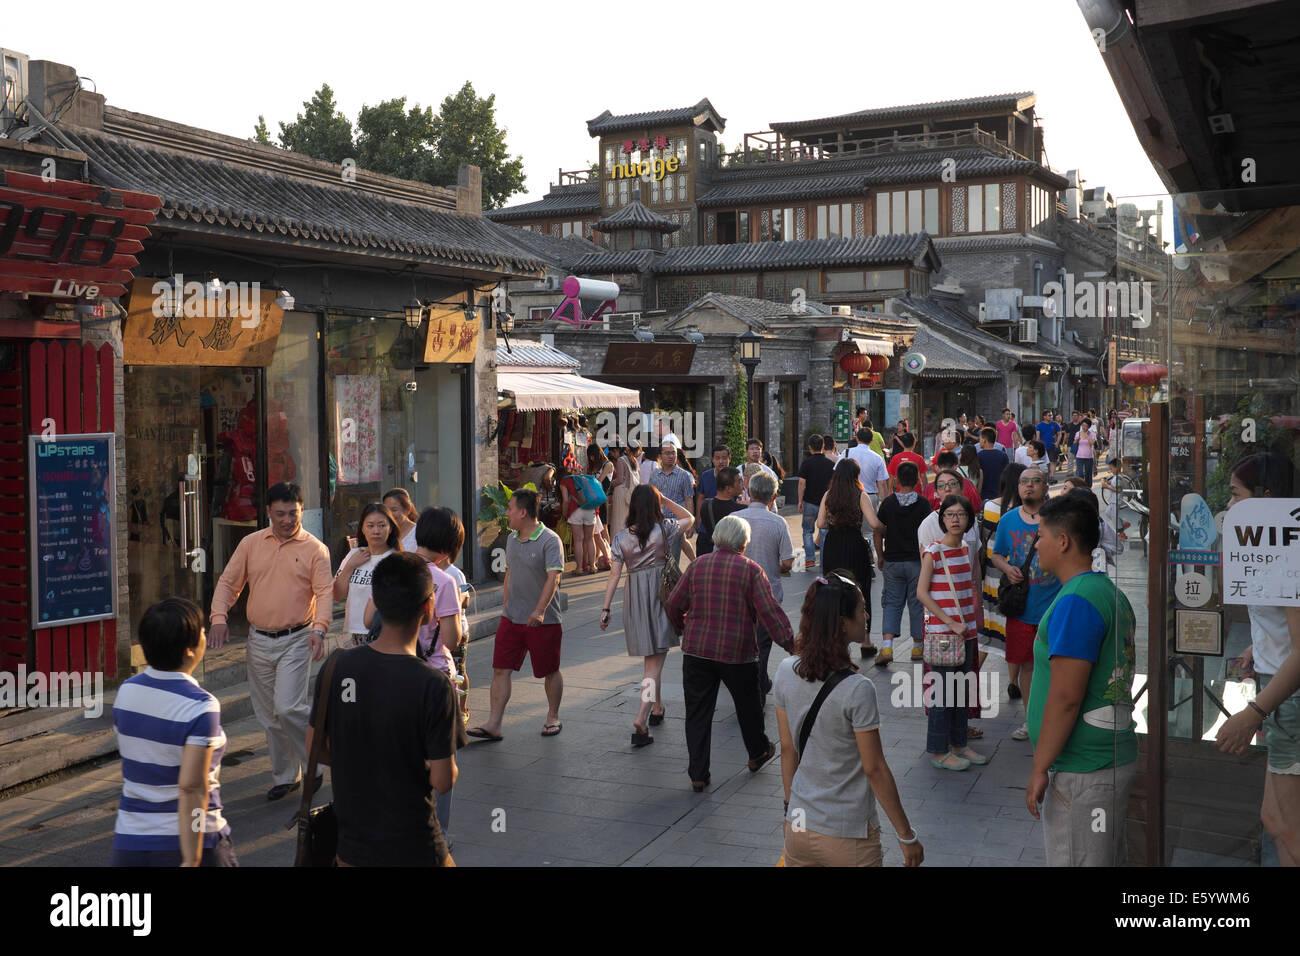 Tourists visit Yandai Xiejie in Houhai,  Beijing, China. 21-Jun-2014 - Stock Image